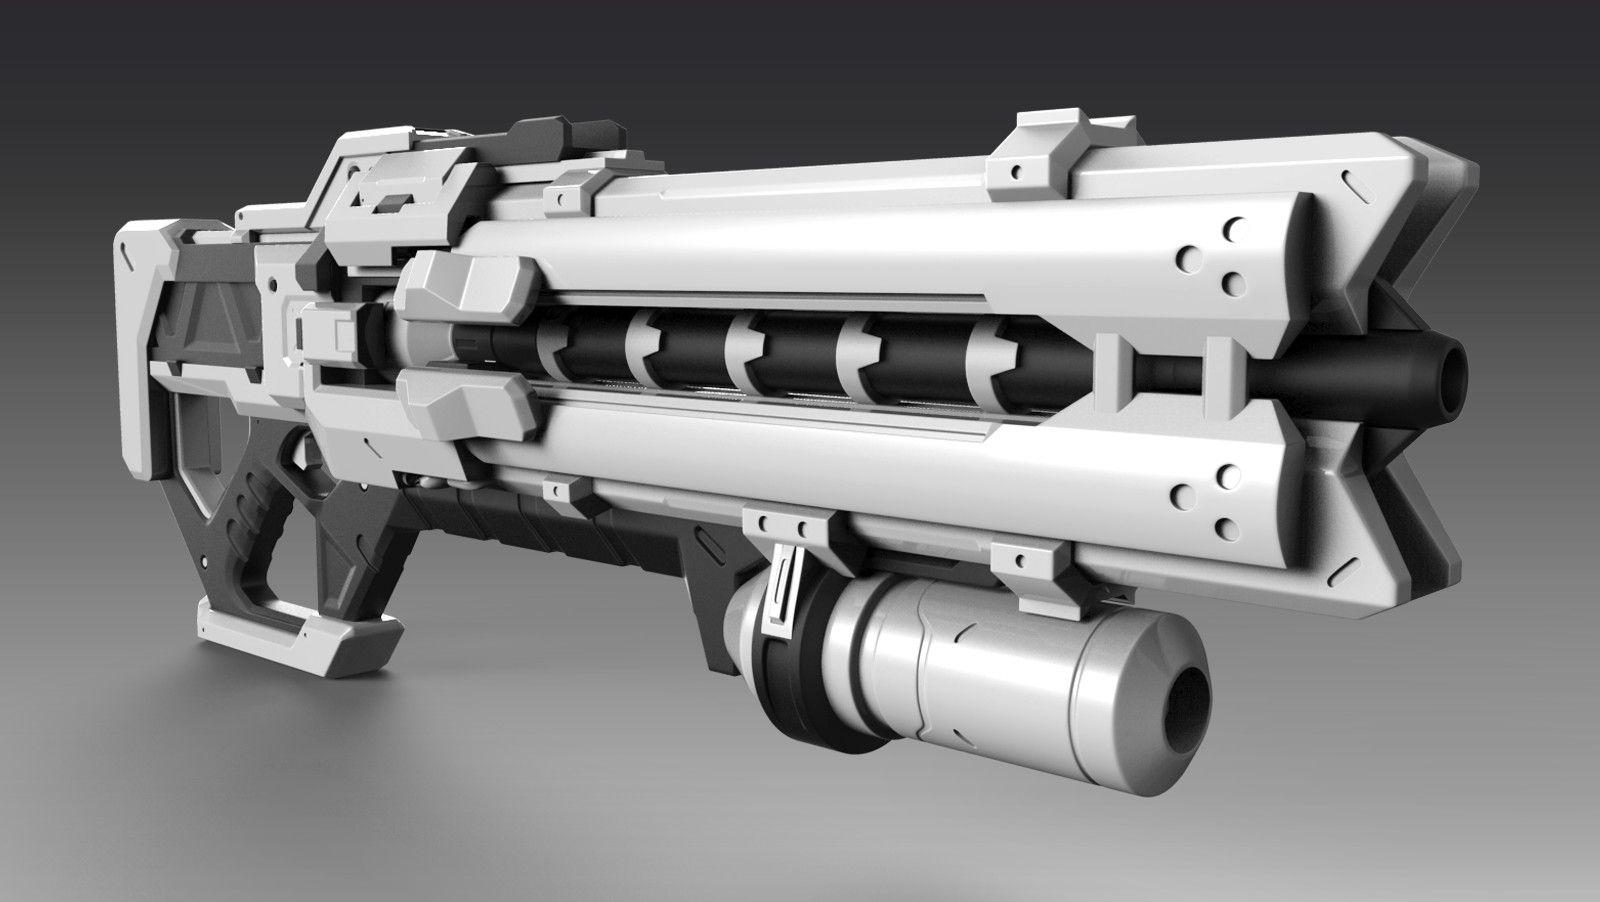 ArtStation - Overwatch - Soldier 76 Weapon (WIP), Dylan Mellott | Guns | Weapons, Overwatch ...